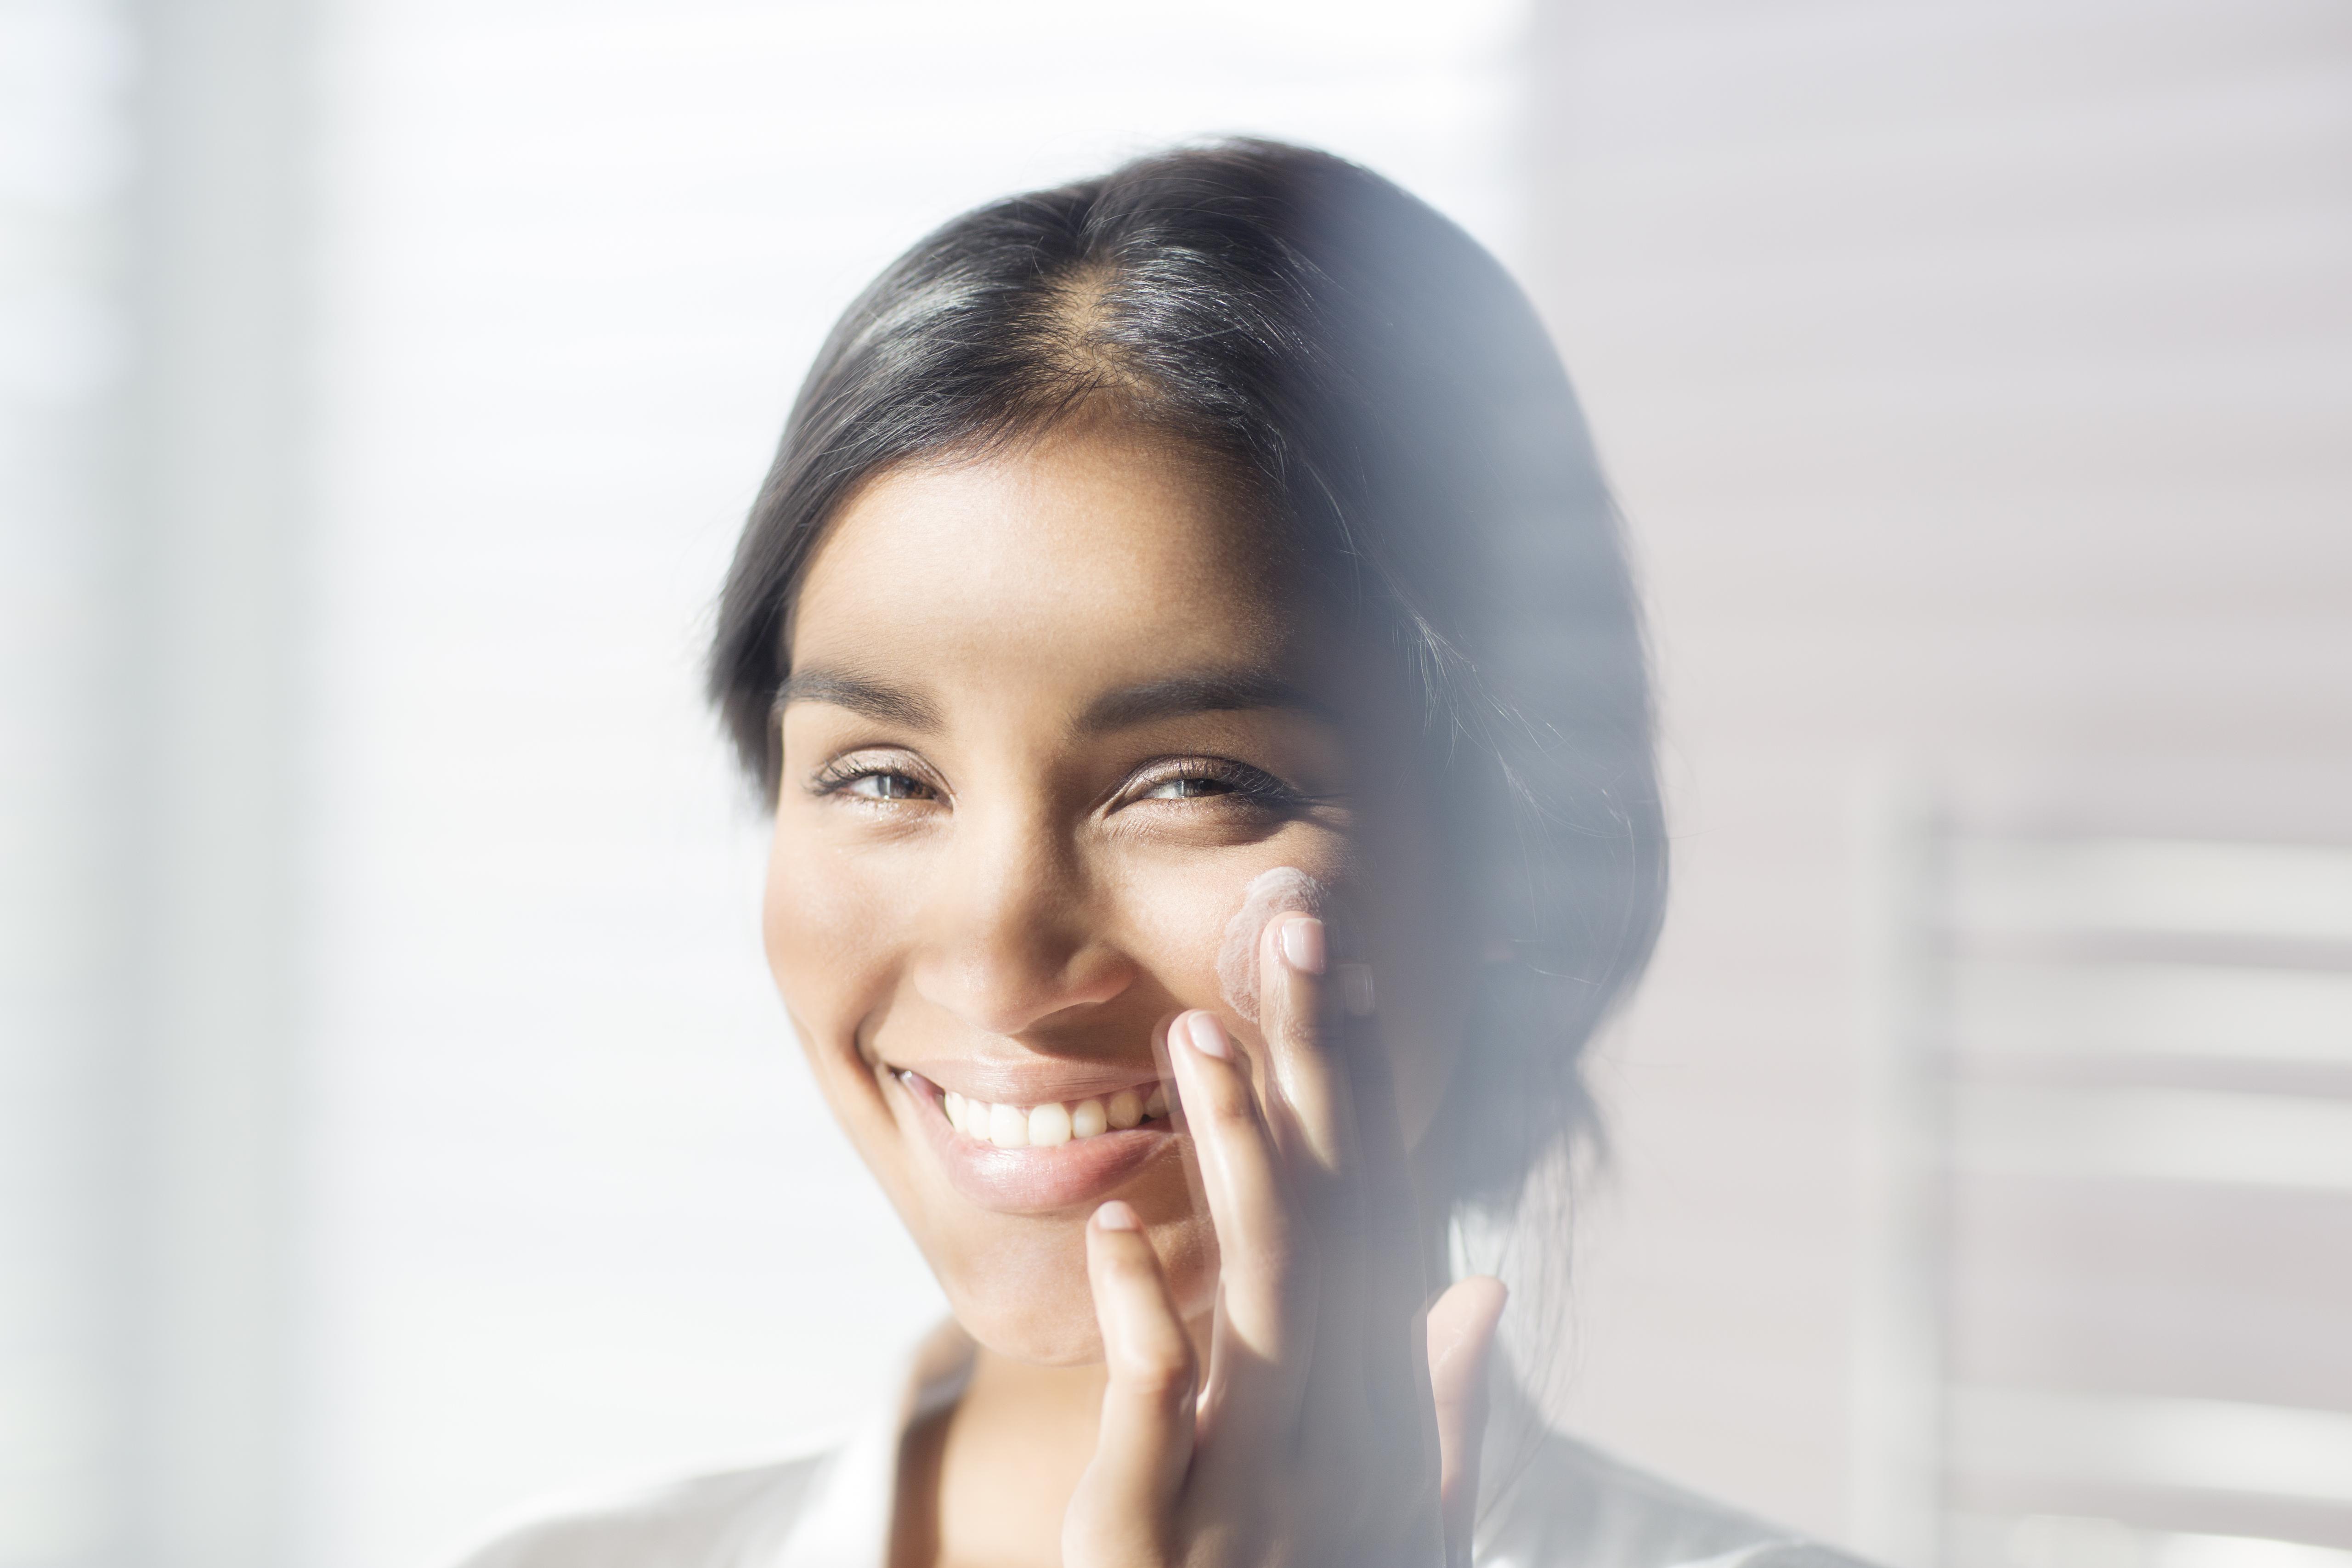 Close up portrait smiling woman applying moisturizer to cheek